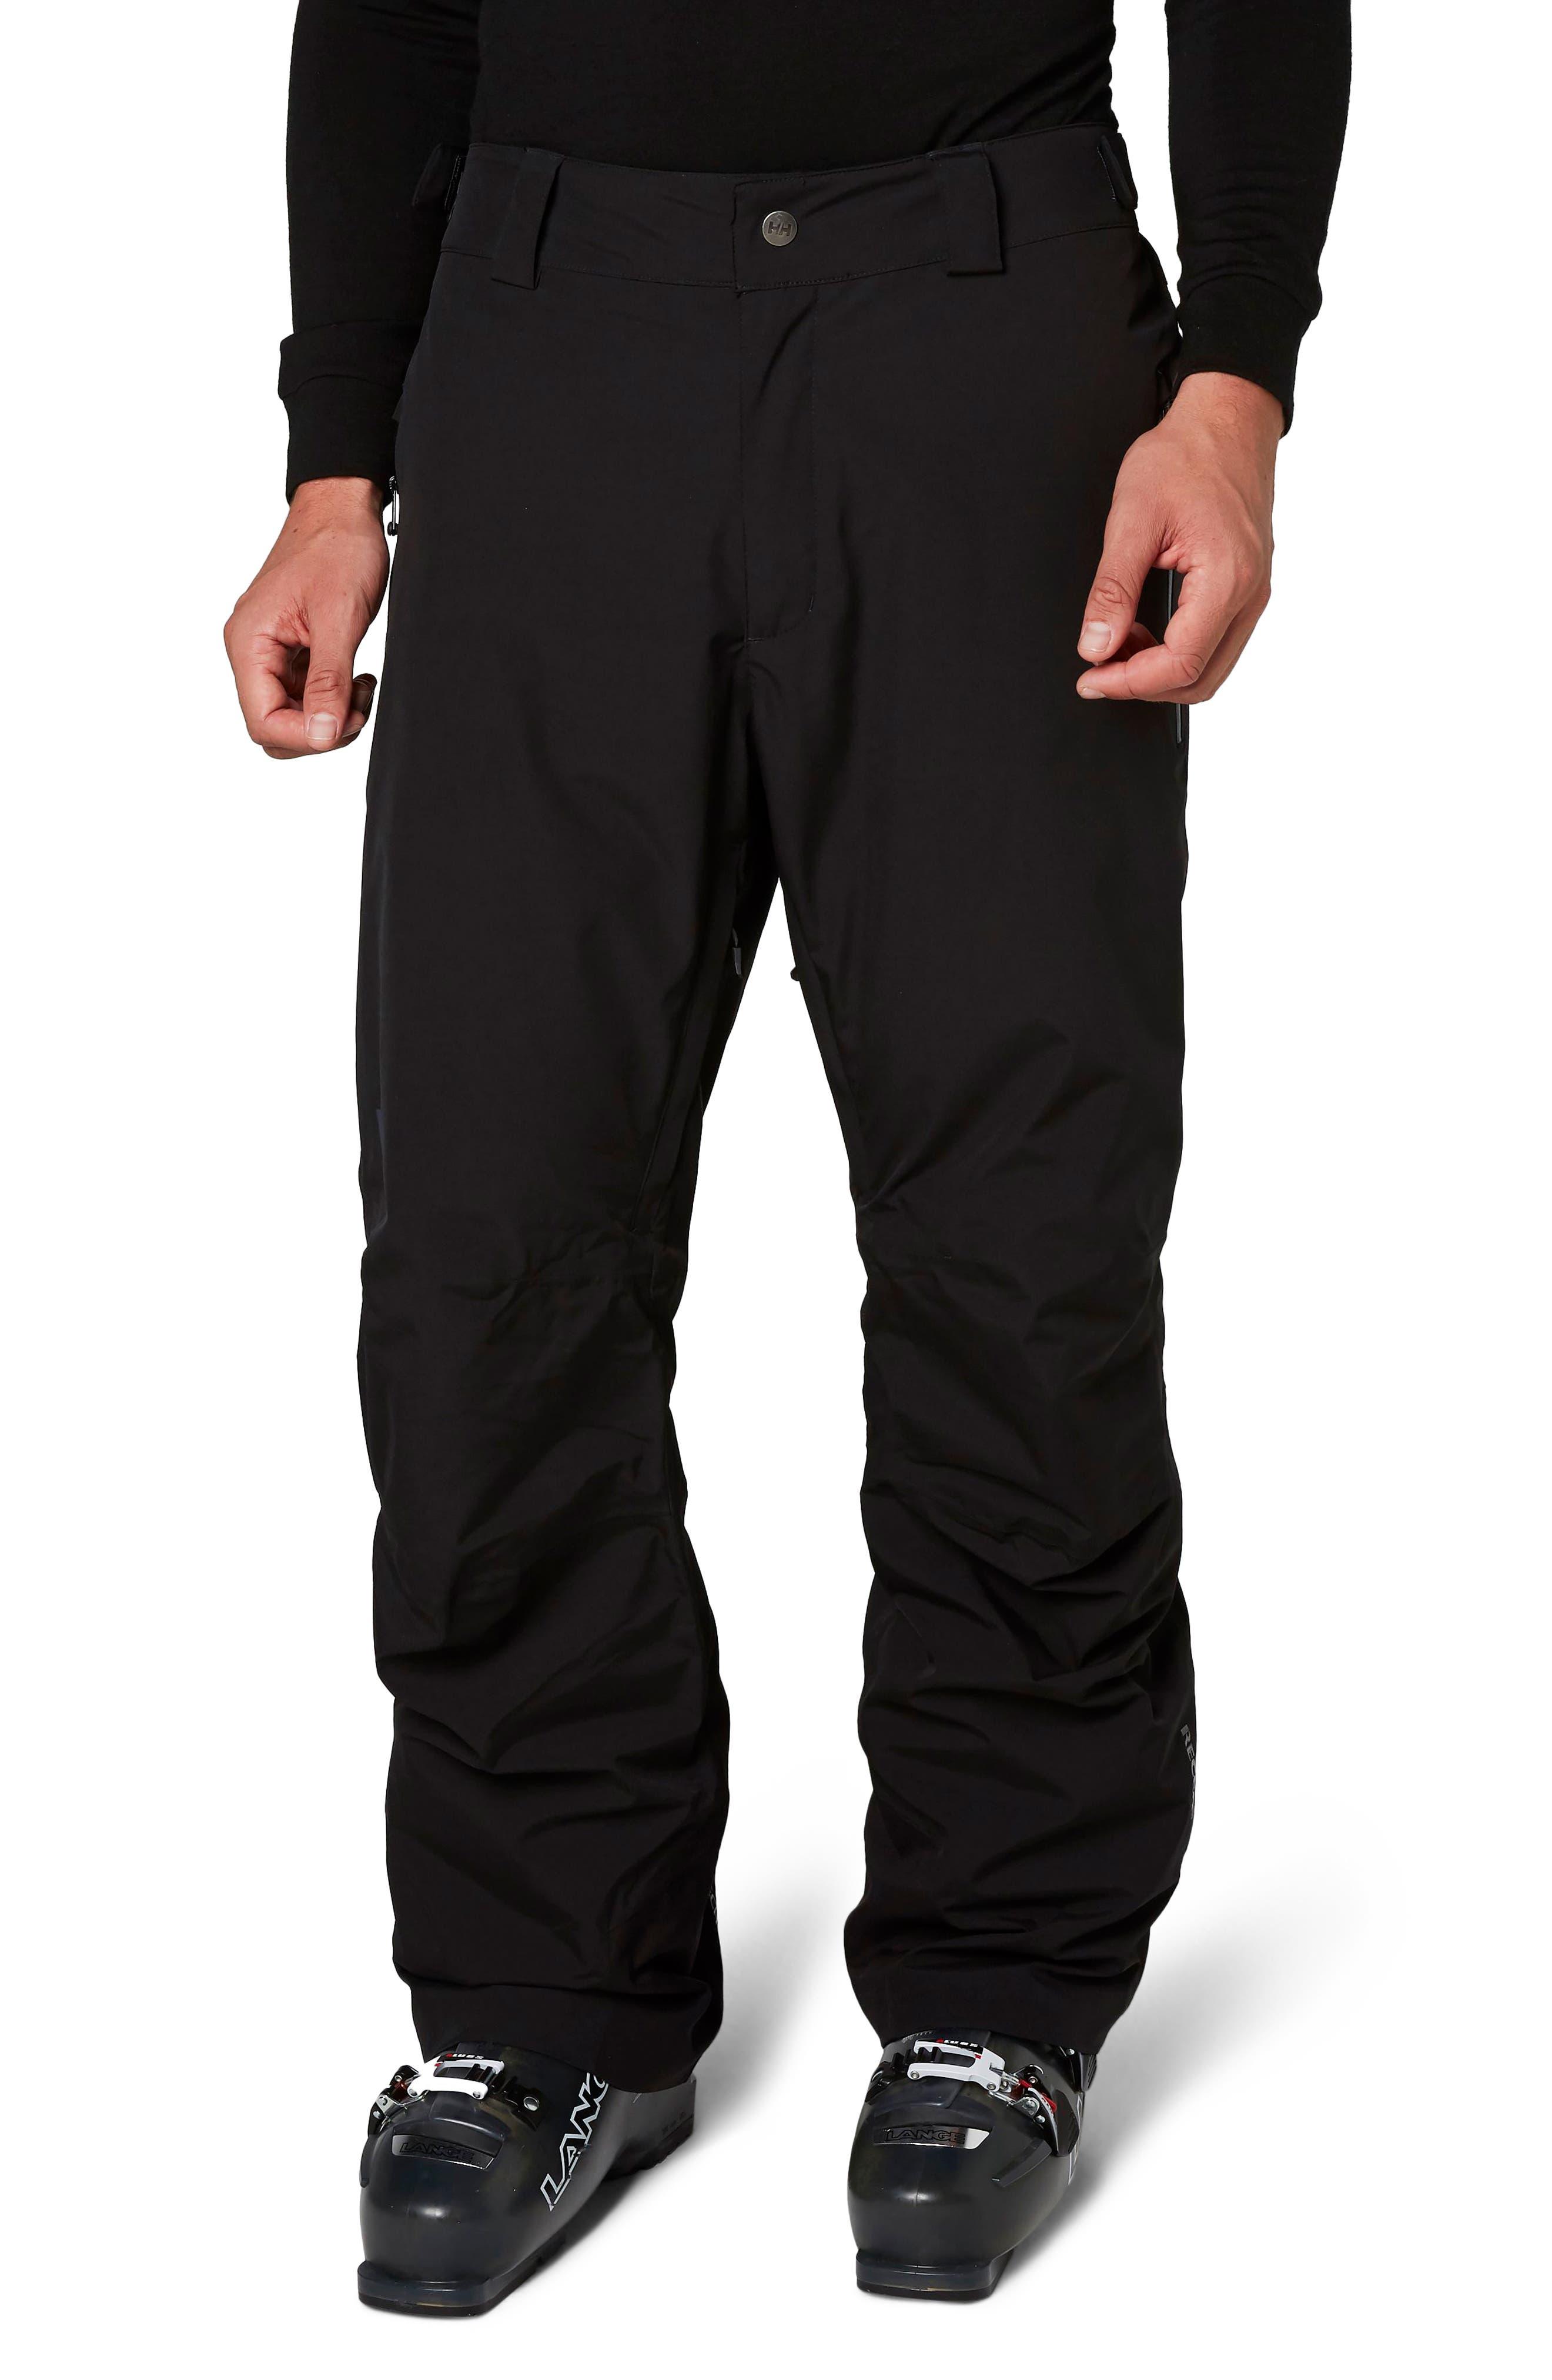 Helly Hansen Legendary Waterproof PrimaLoft® Insulated Snow Pants